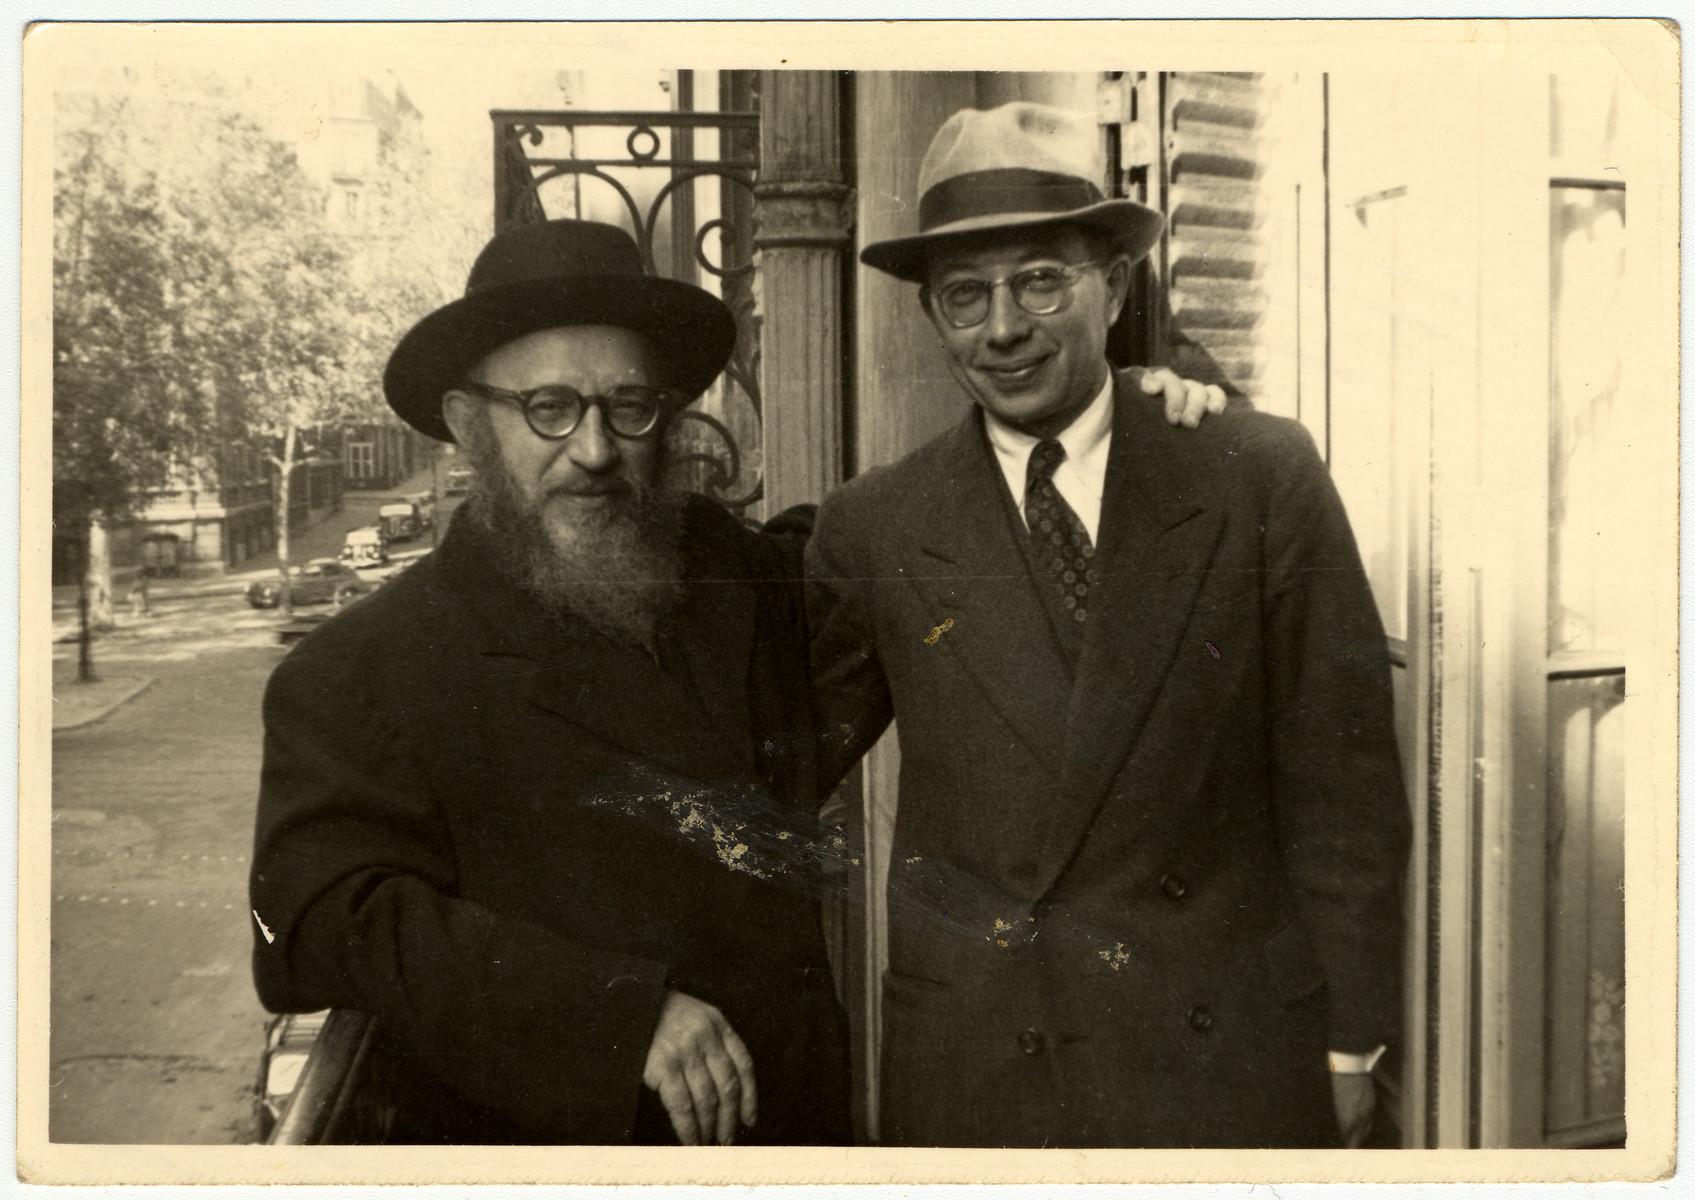 Rabbi Zalman Schneerson and Rabbi Kotujanski pose on a balcony in Paris after the war.